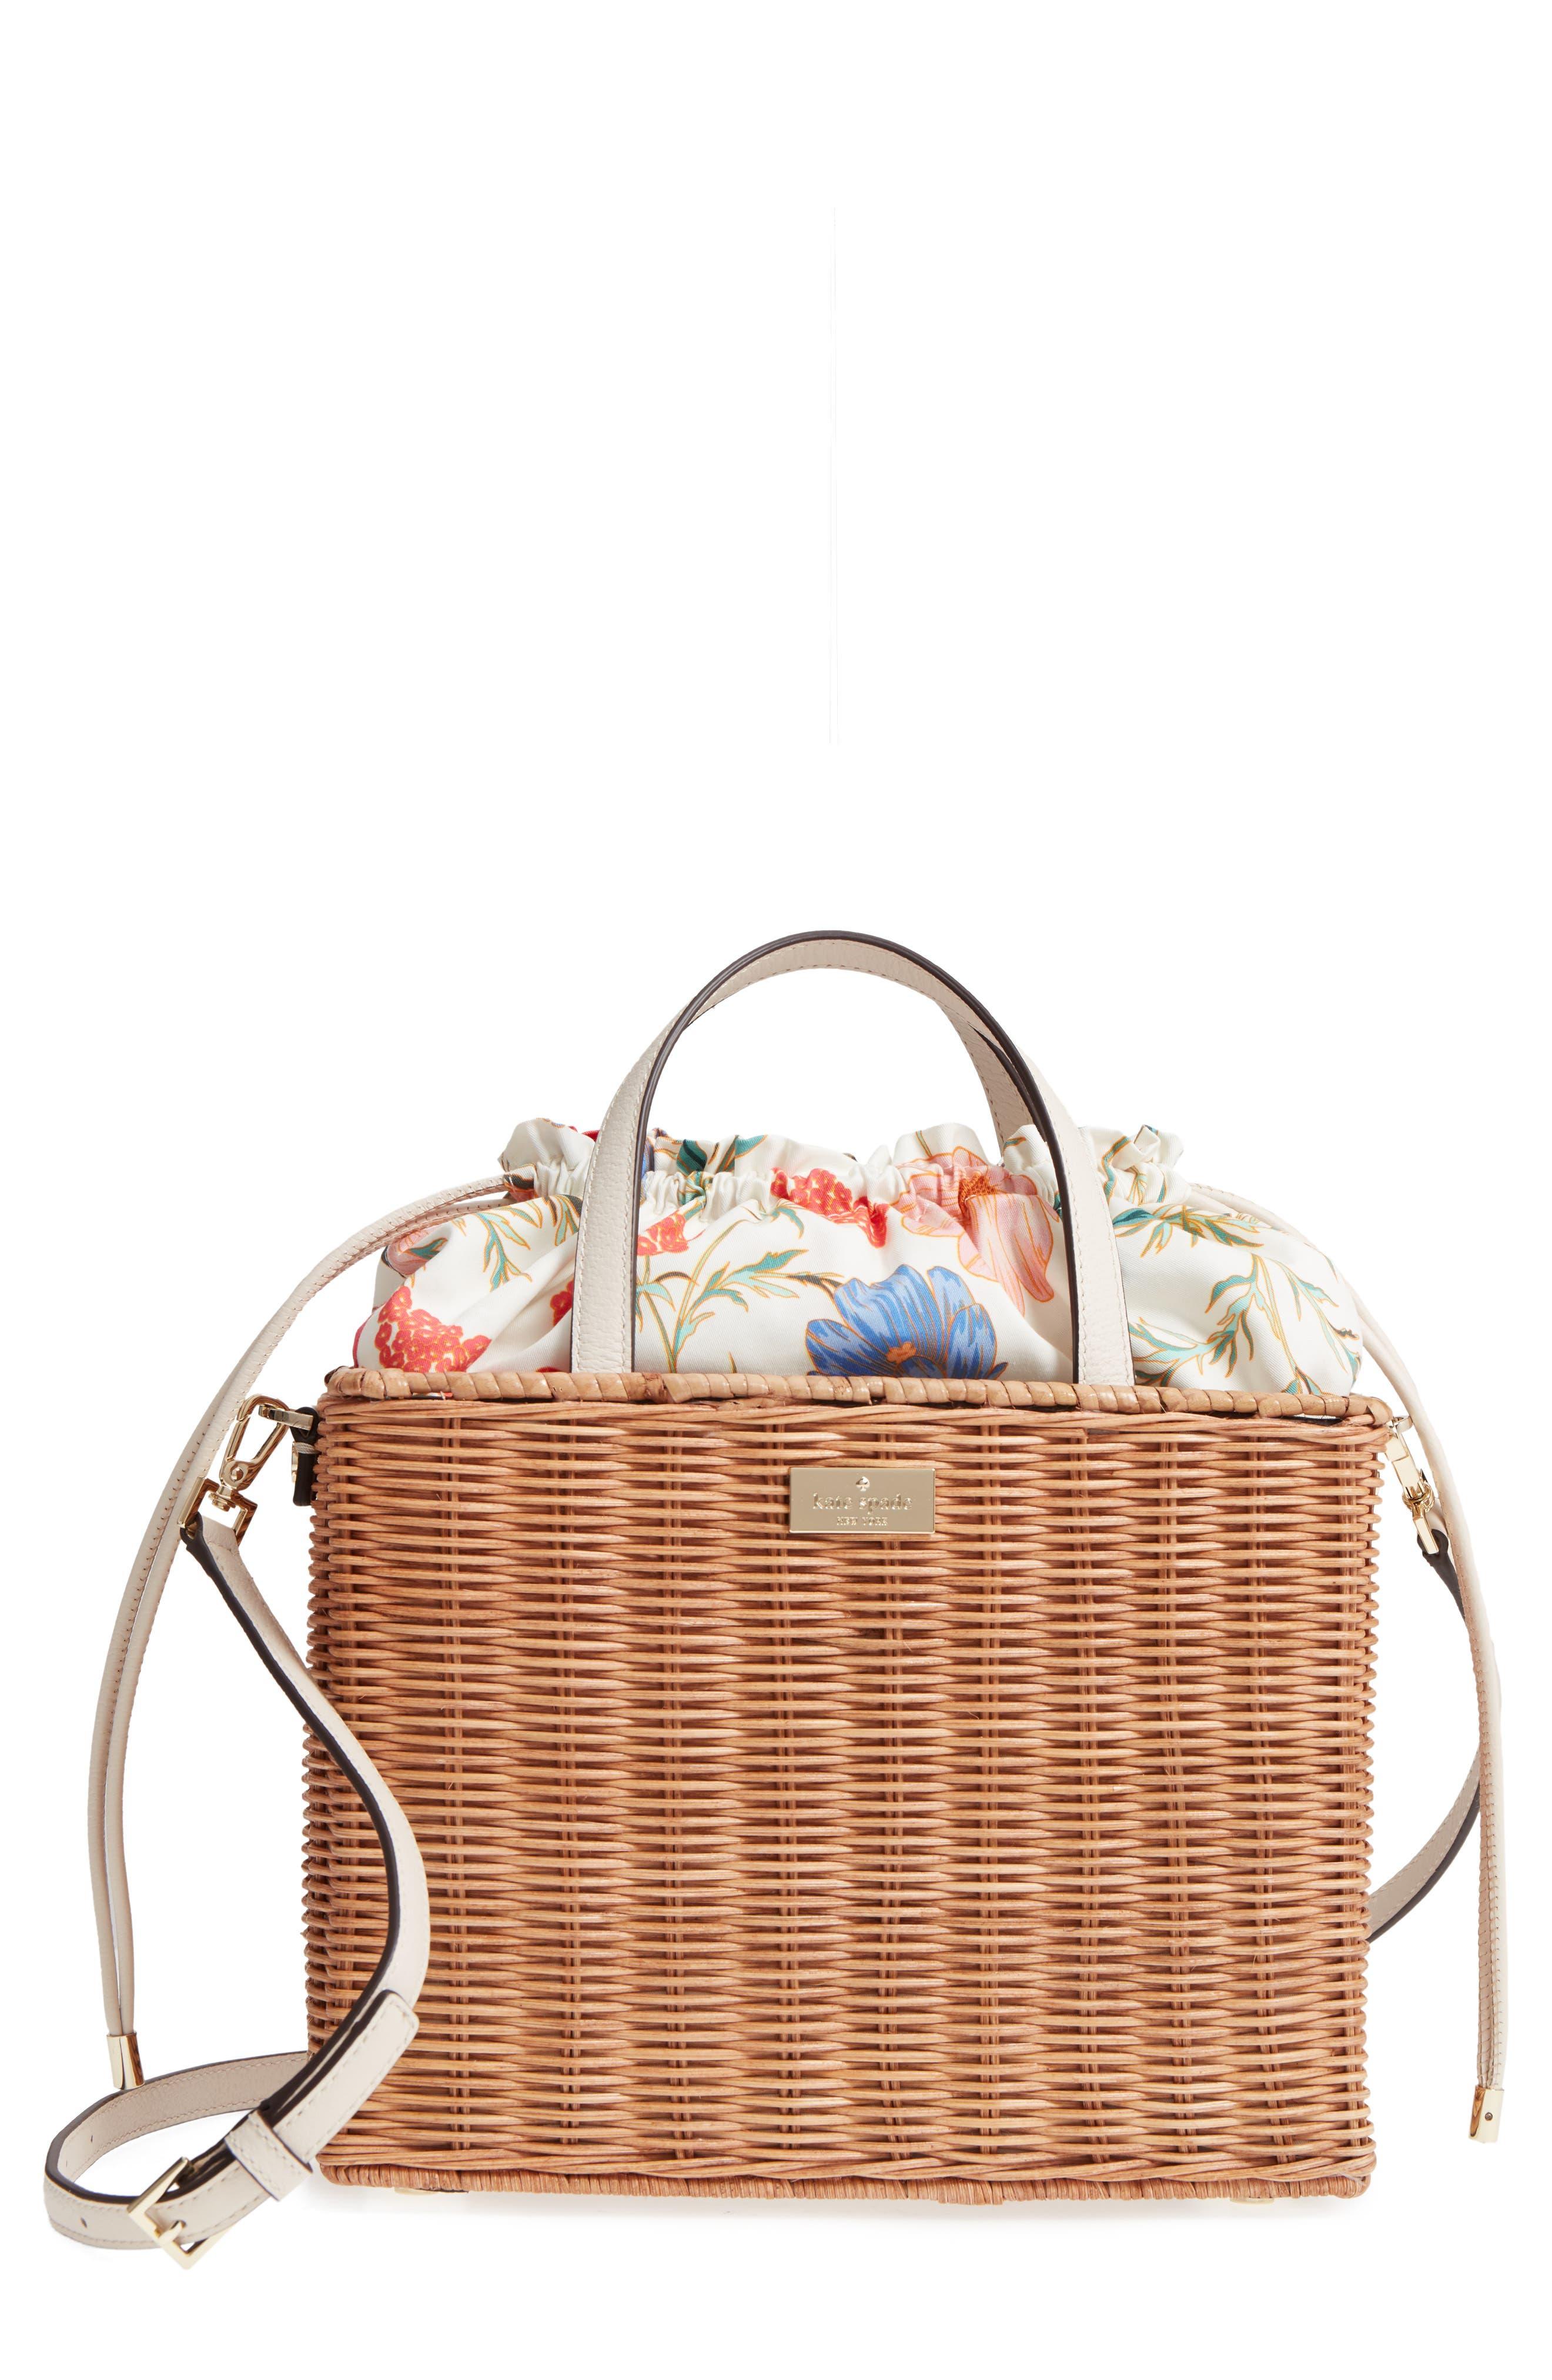 bloom street - sam rattan satchel,                             Main thumbnail 1, color,                             200